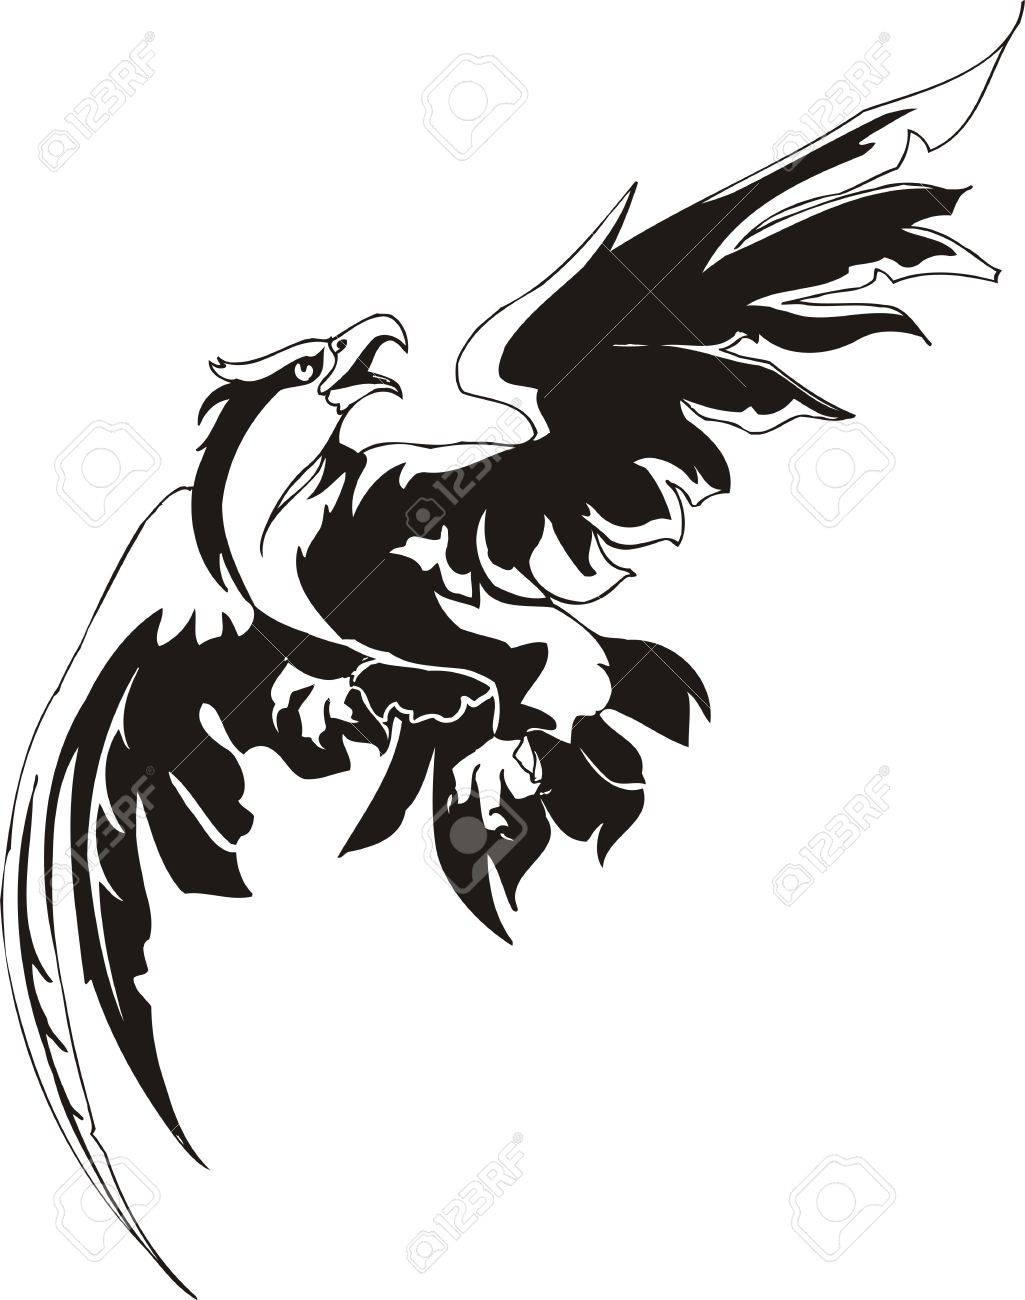 Eagle - predatory bird. illustration. Ready for vinyl cutting. Stock Vector - 8332285